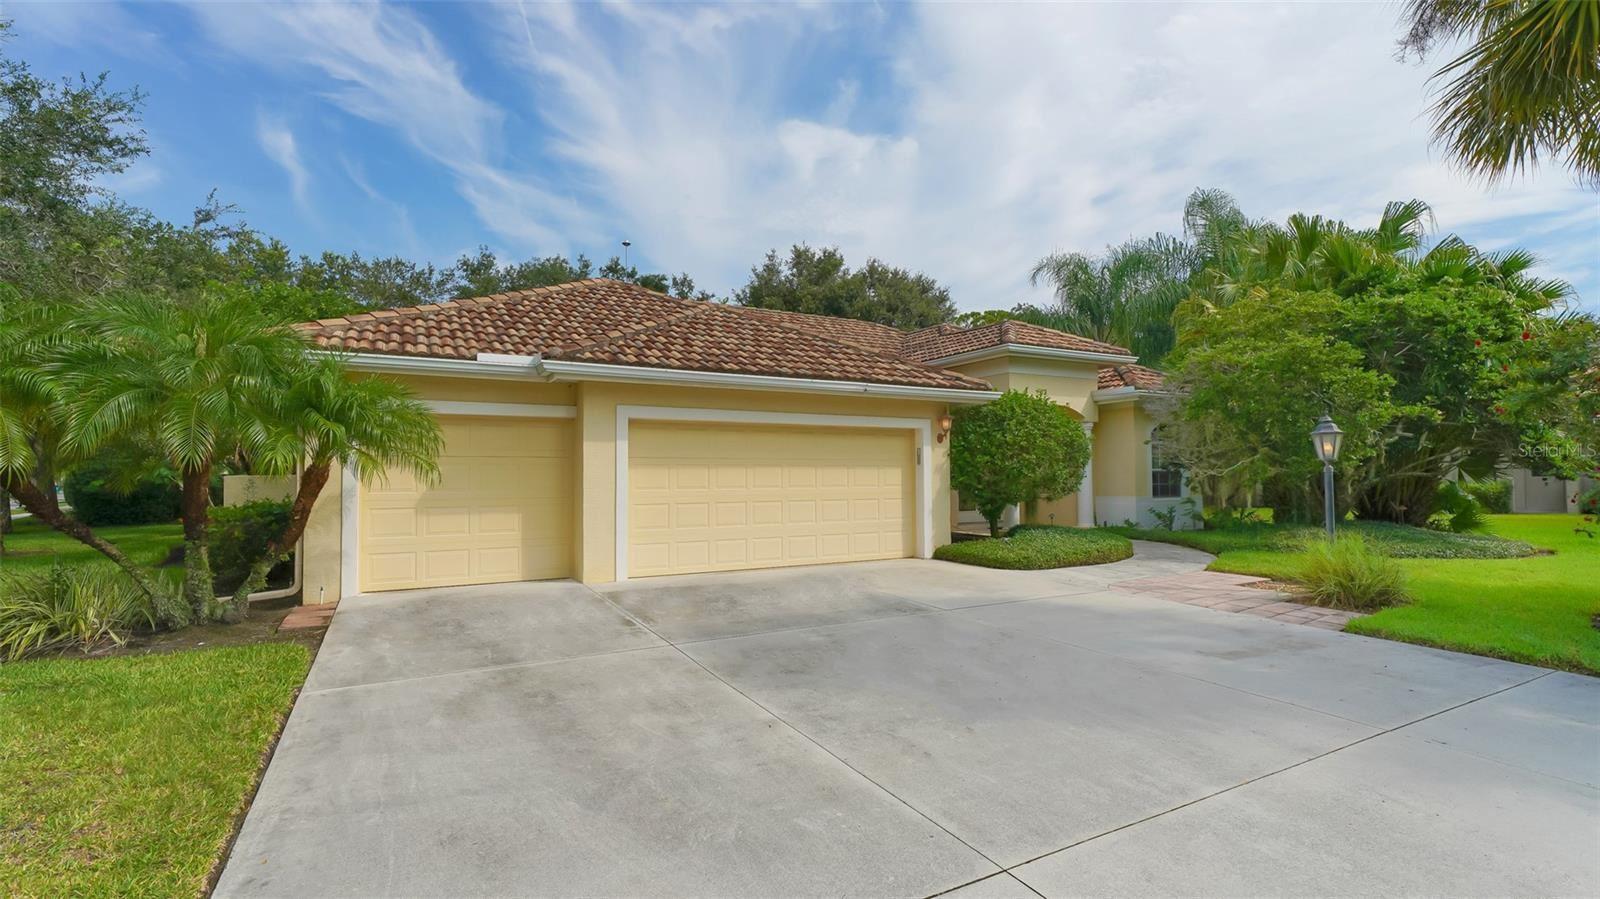 3878 ROYAL HAMMOCK BOULEVARD, Sarasota, FL 34240 - #: A4506726